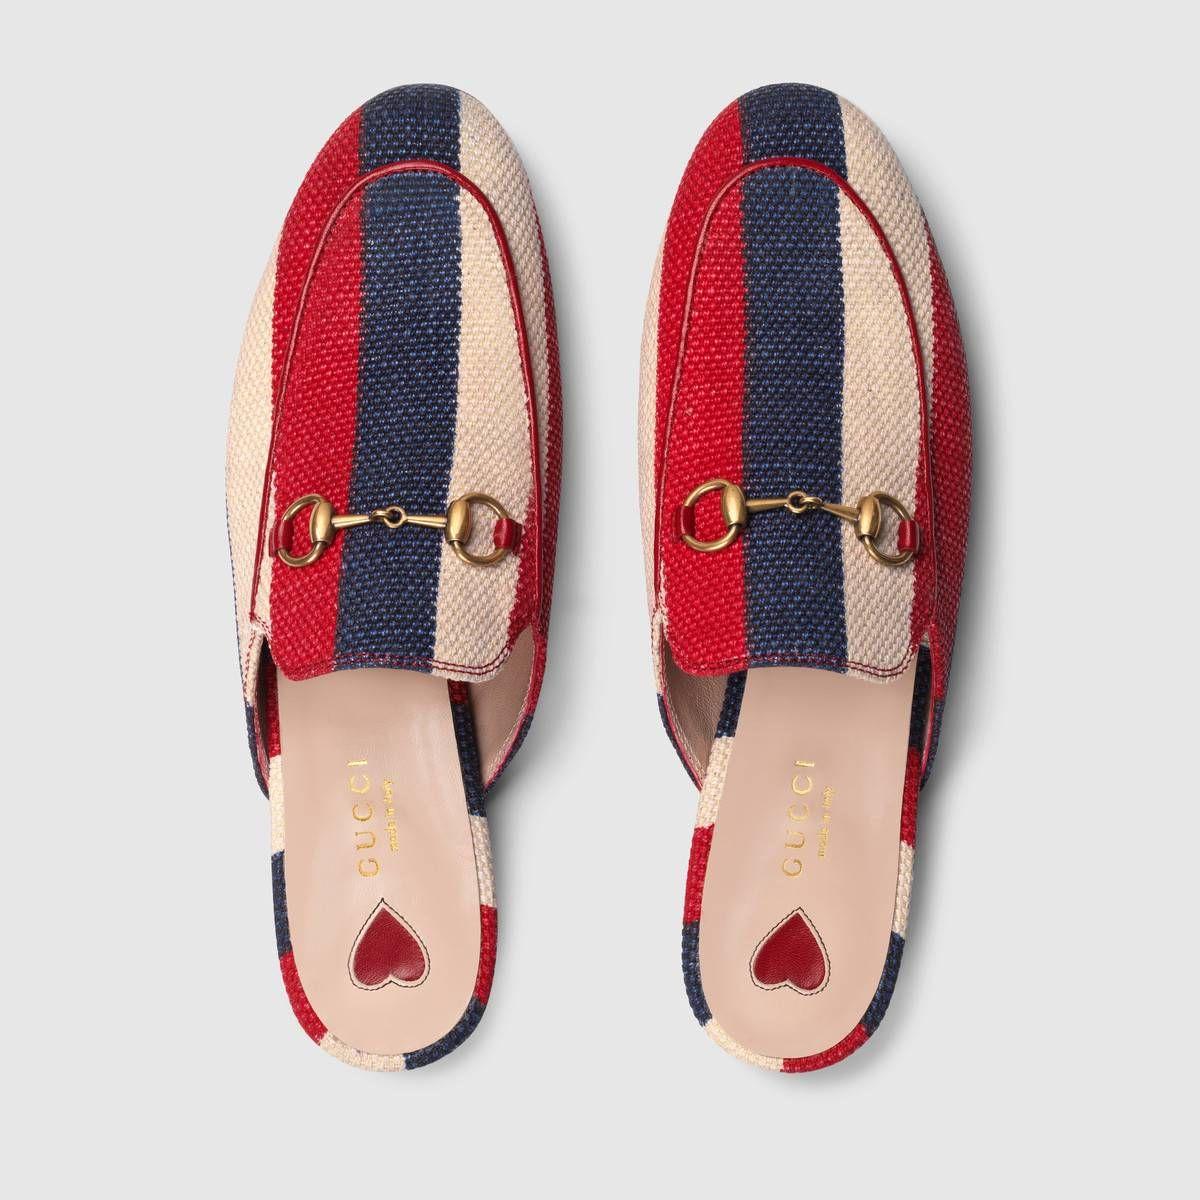 c8099e88e5 Shop the Princetown Sylvie canvas slipper by Gucci. Originally ...